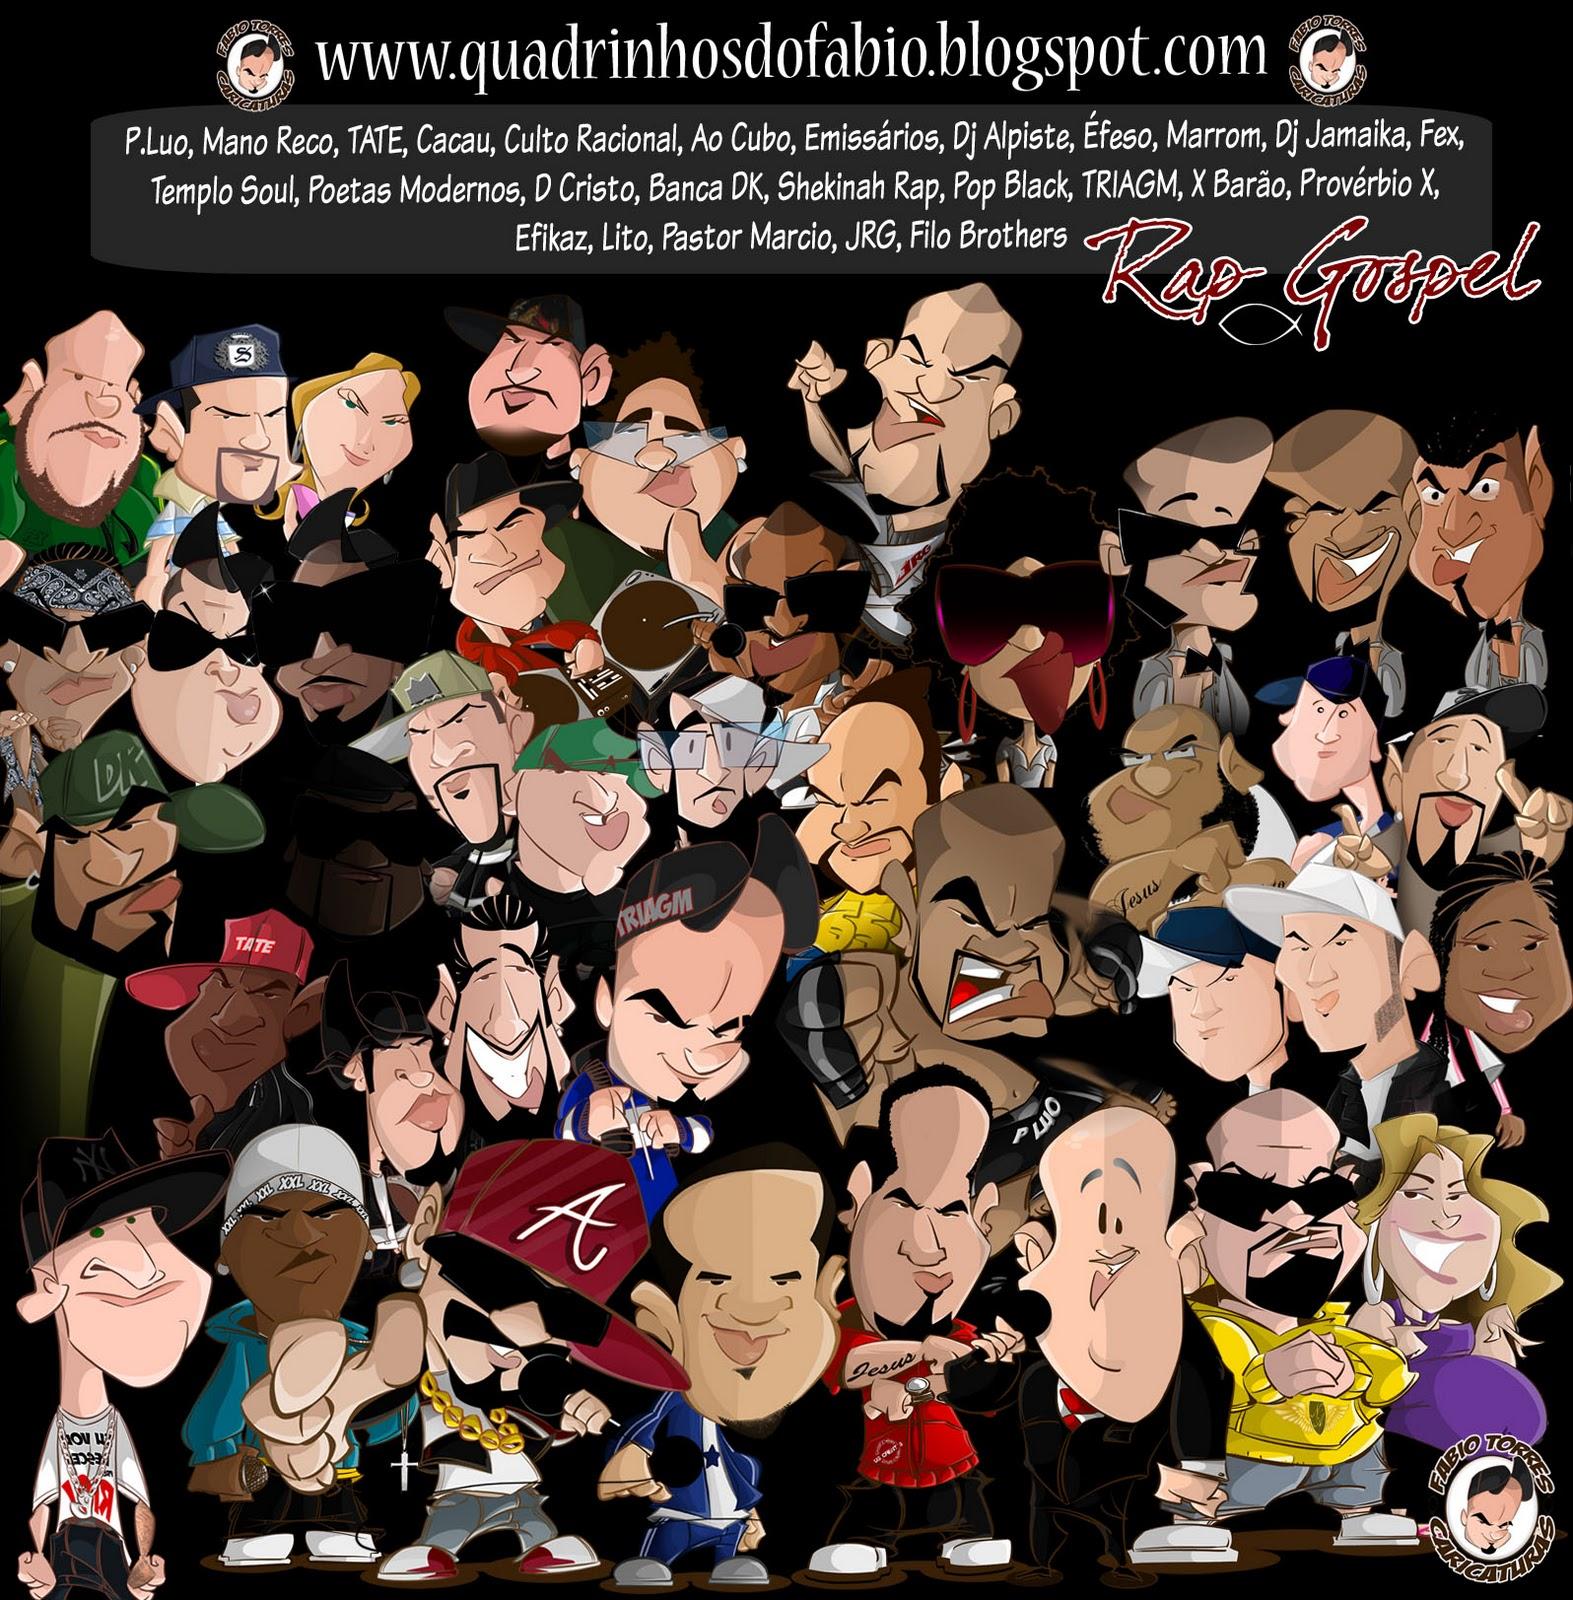 http://2.bp.blogspot.com/-5Py7A7VX4ao/TyhGhVJyRaI/AAAAAAAAEHs/FzWrnY0UyWY/s1600/WALLPAPER+RAP+GOSPEL_ALTA.jpg